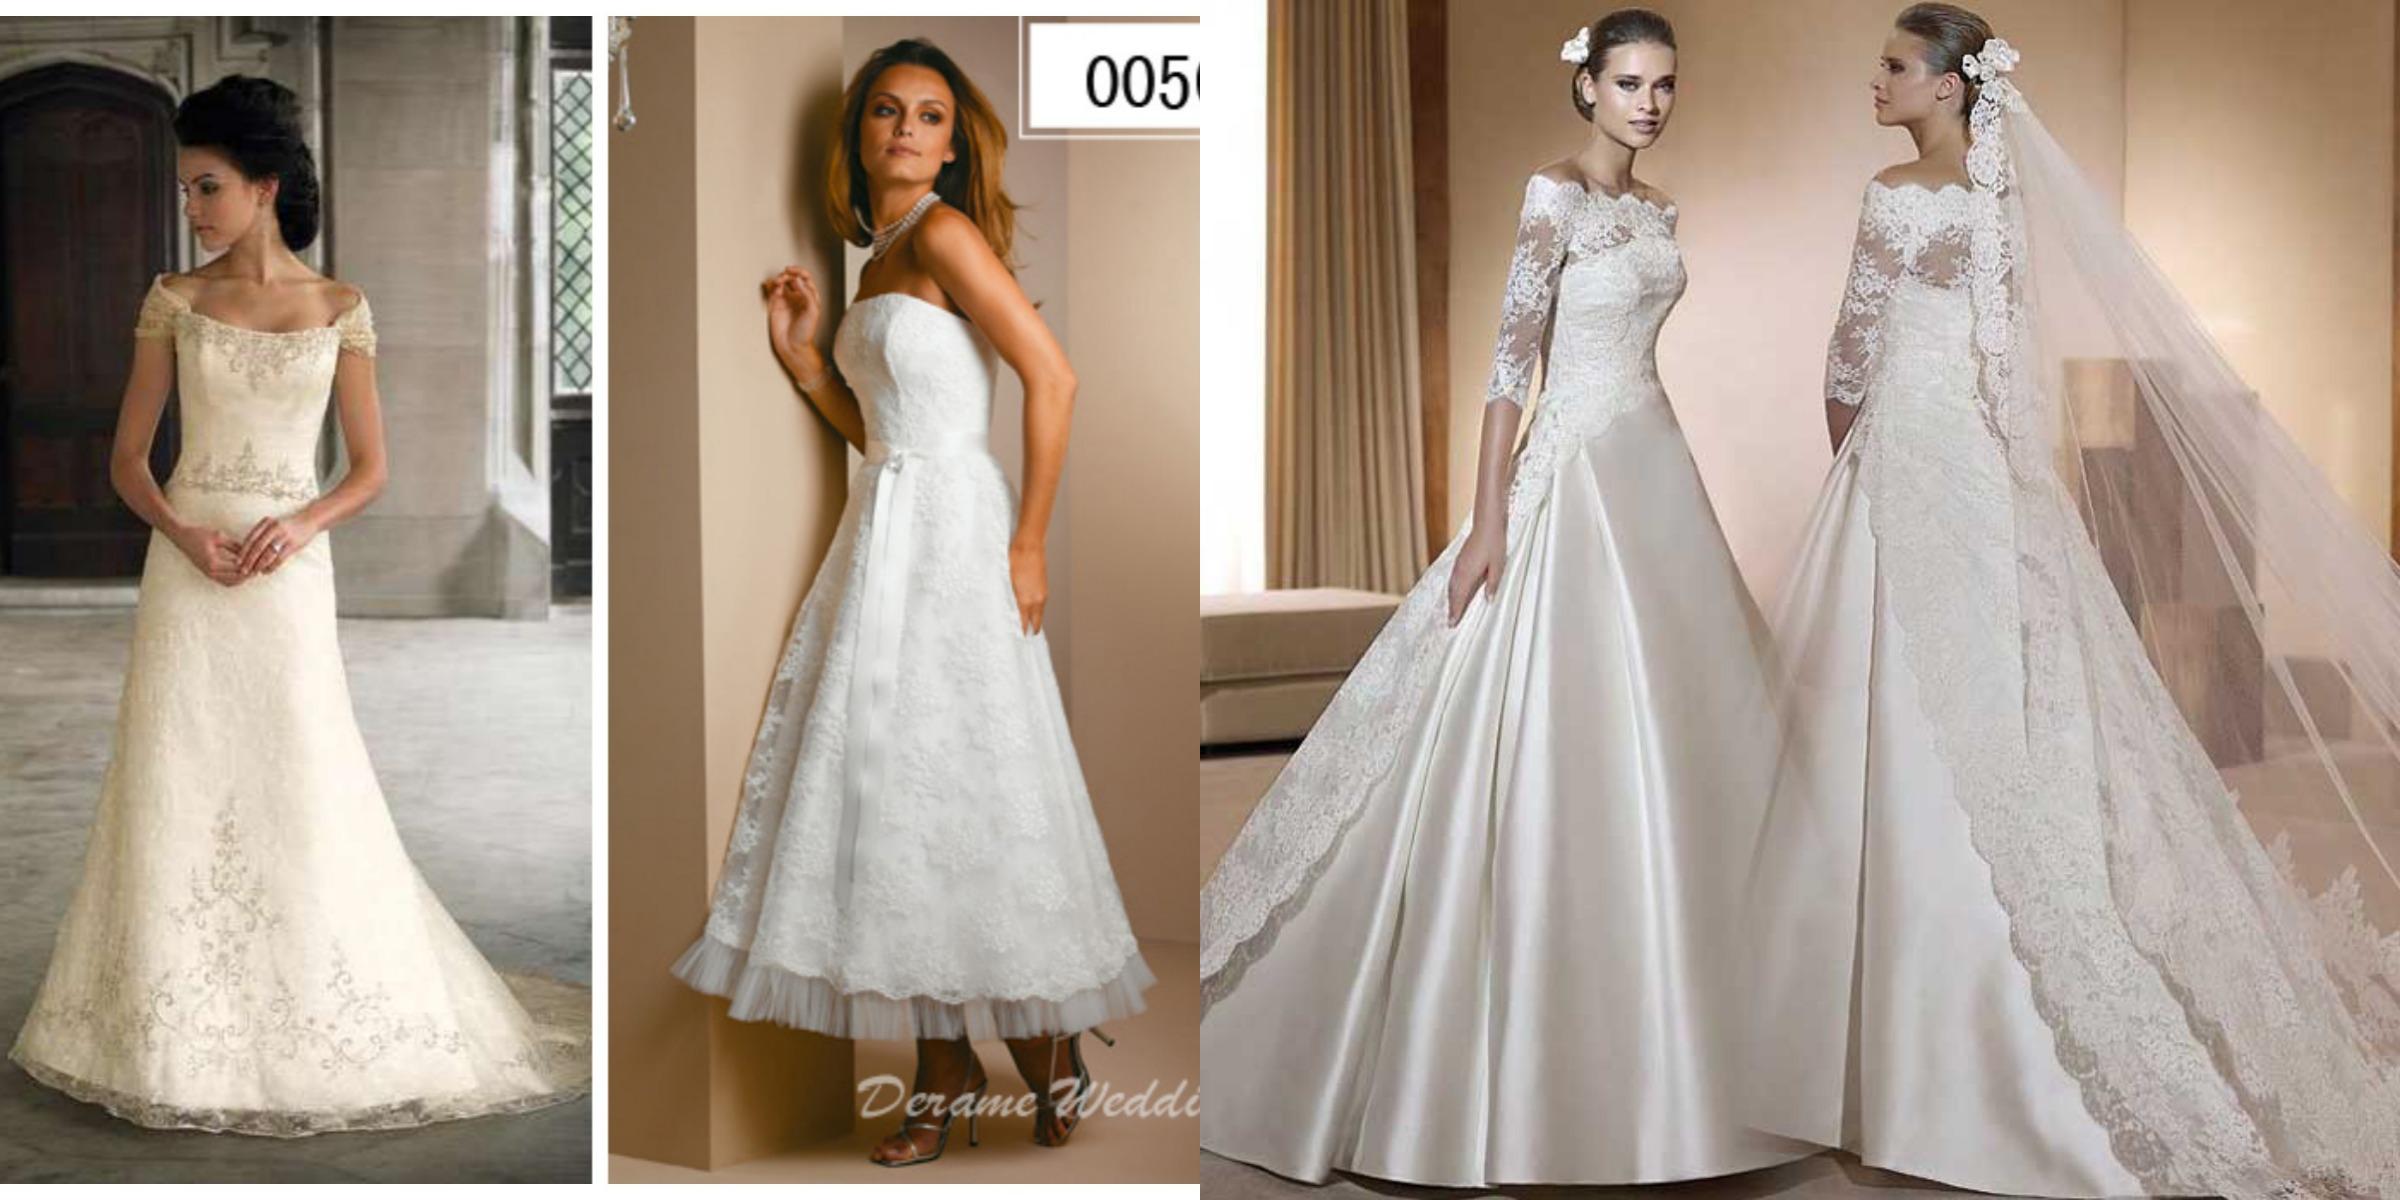 wedding dresses for petite woman wedding dresses for petite Wedding Dresses For Petite Woman